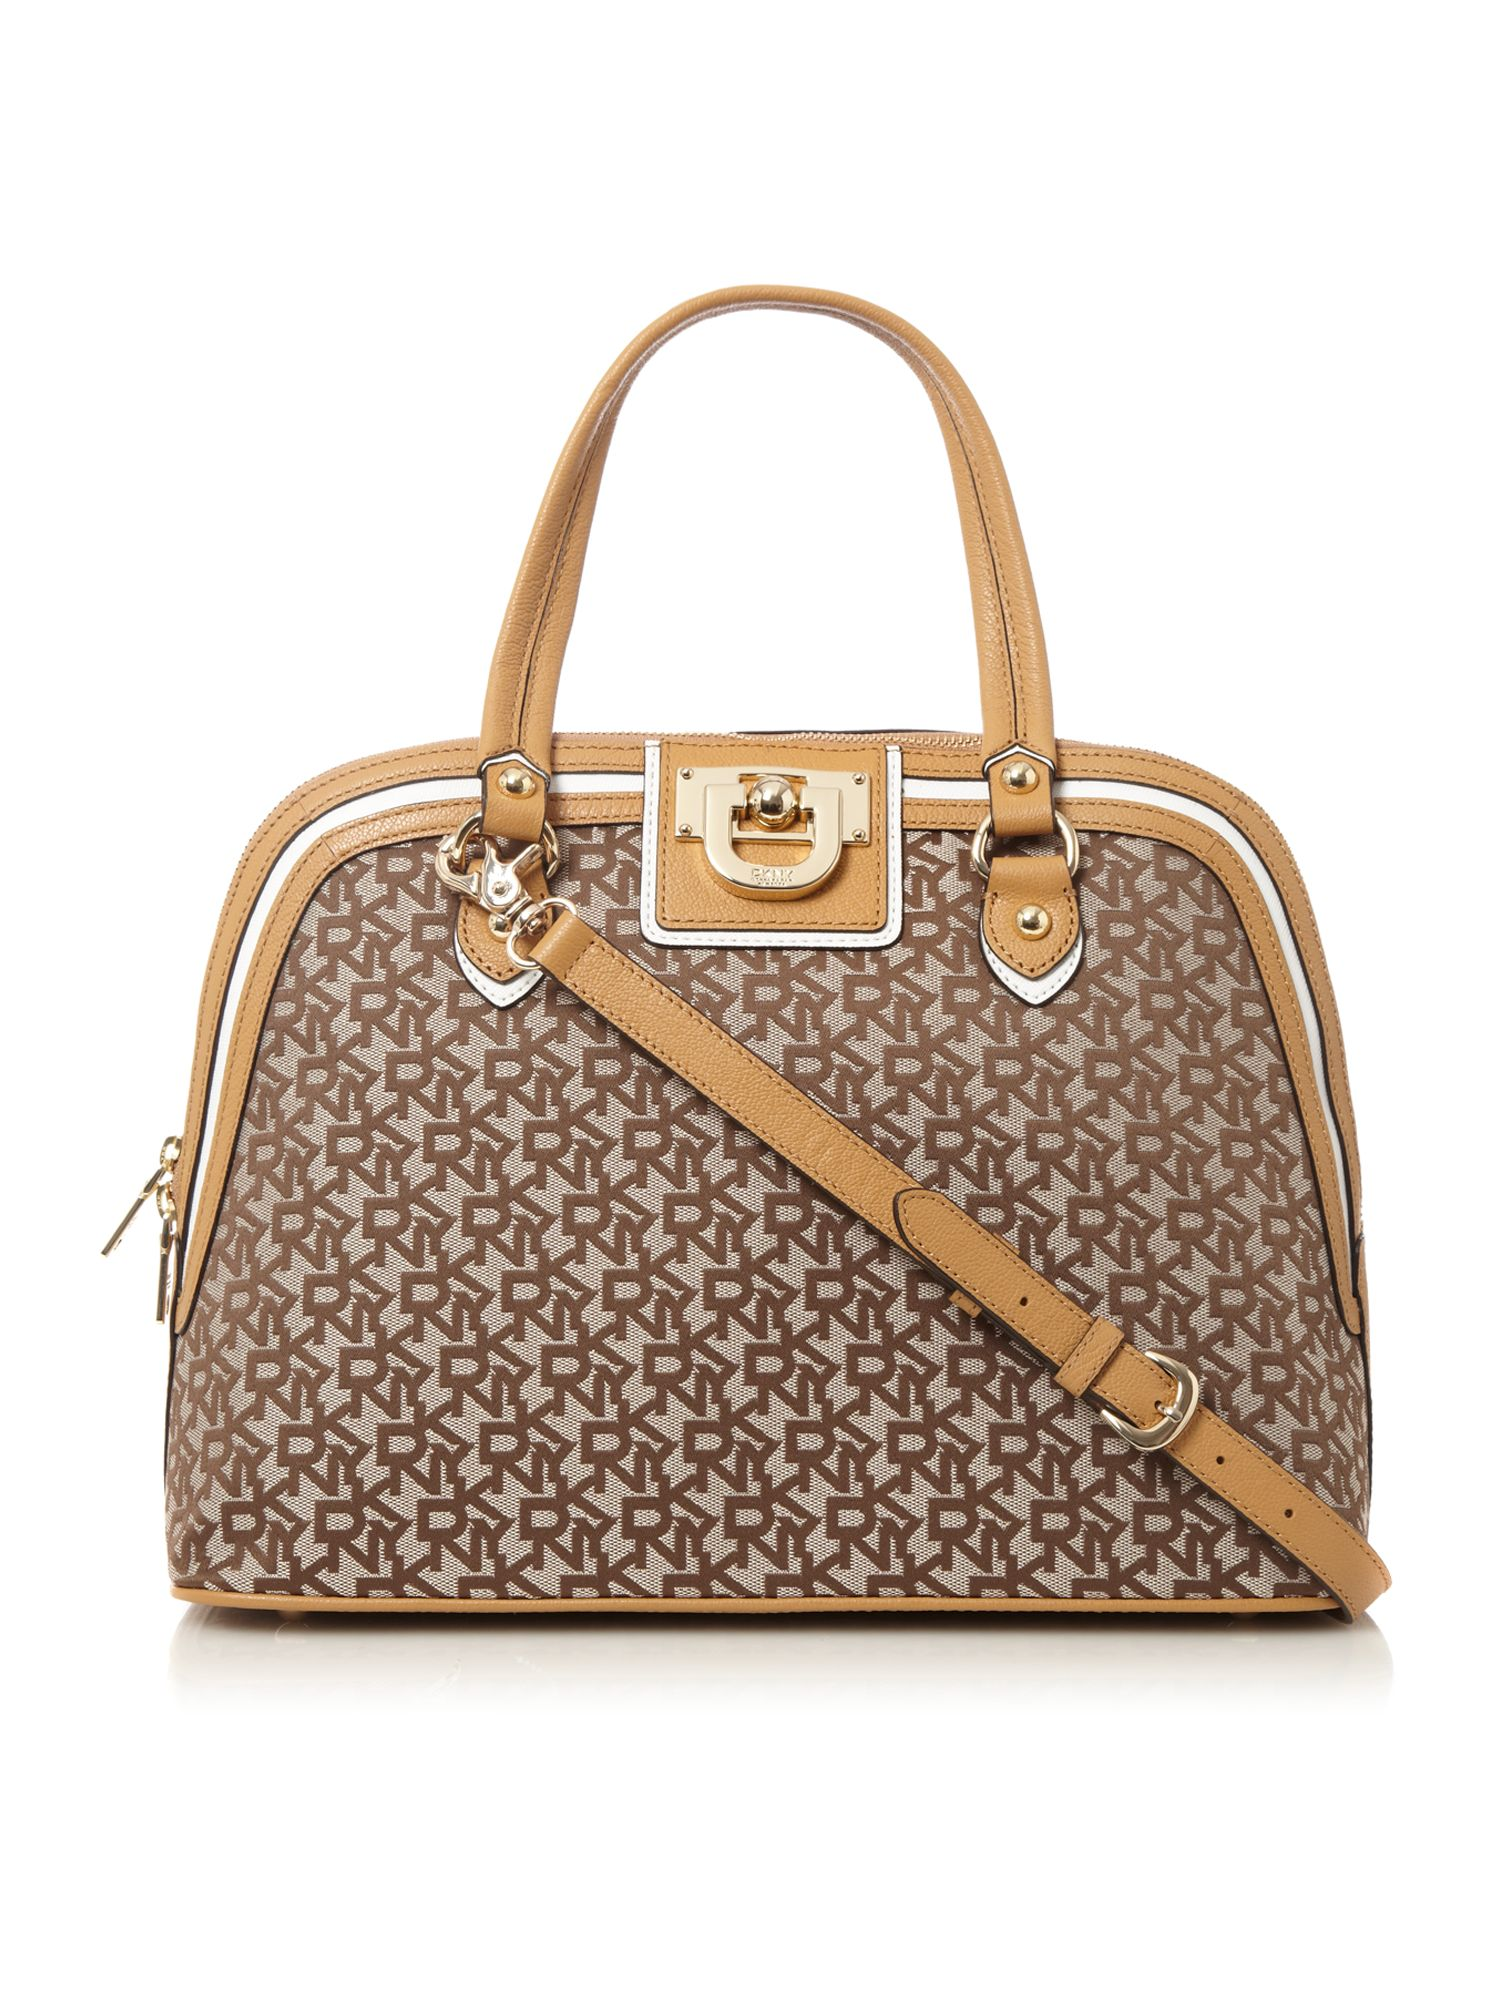 Dkny Medium Dome Bag in Brown | Lyst